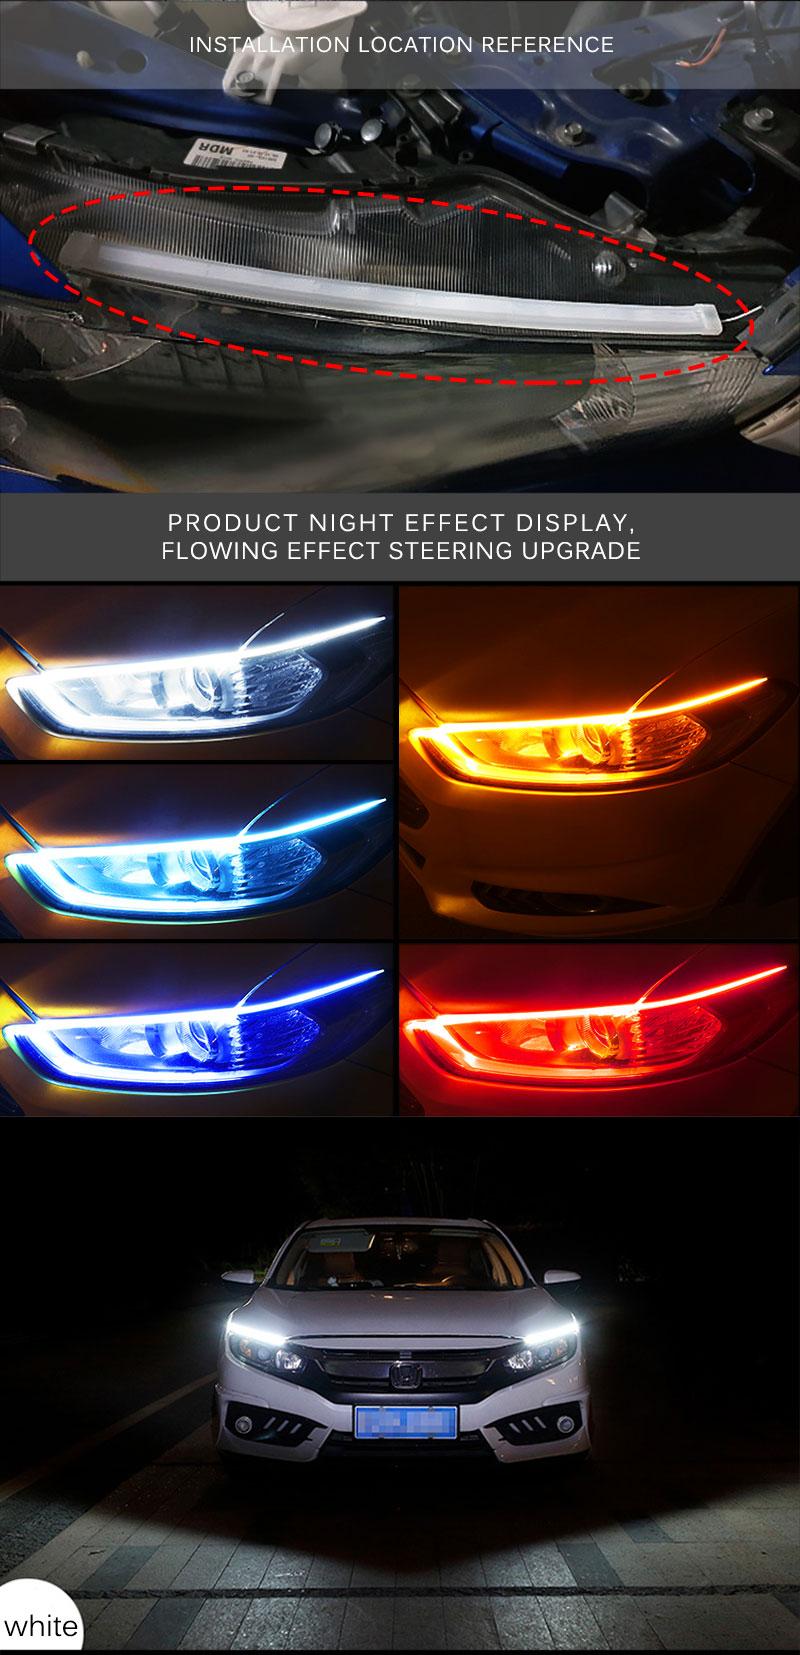 H83bb9dffc1db4848909100a76c8ac422h Ceyes 2pcs Led DRL Daytime Running Lights Turn Signal DRL Led Strip Car Light Accessories Brake Side Lights Headlights For Auto